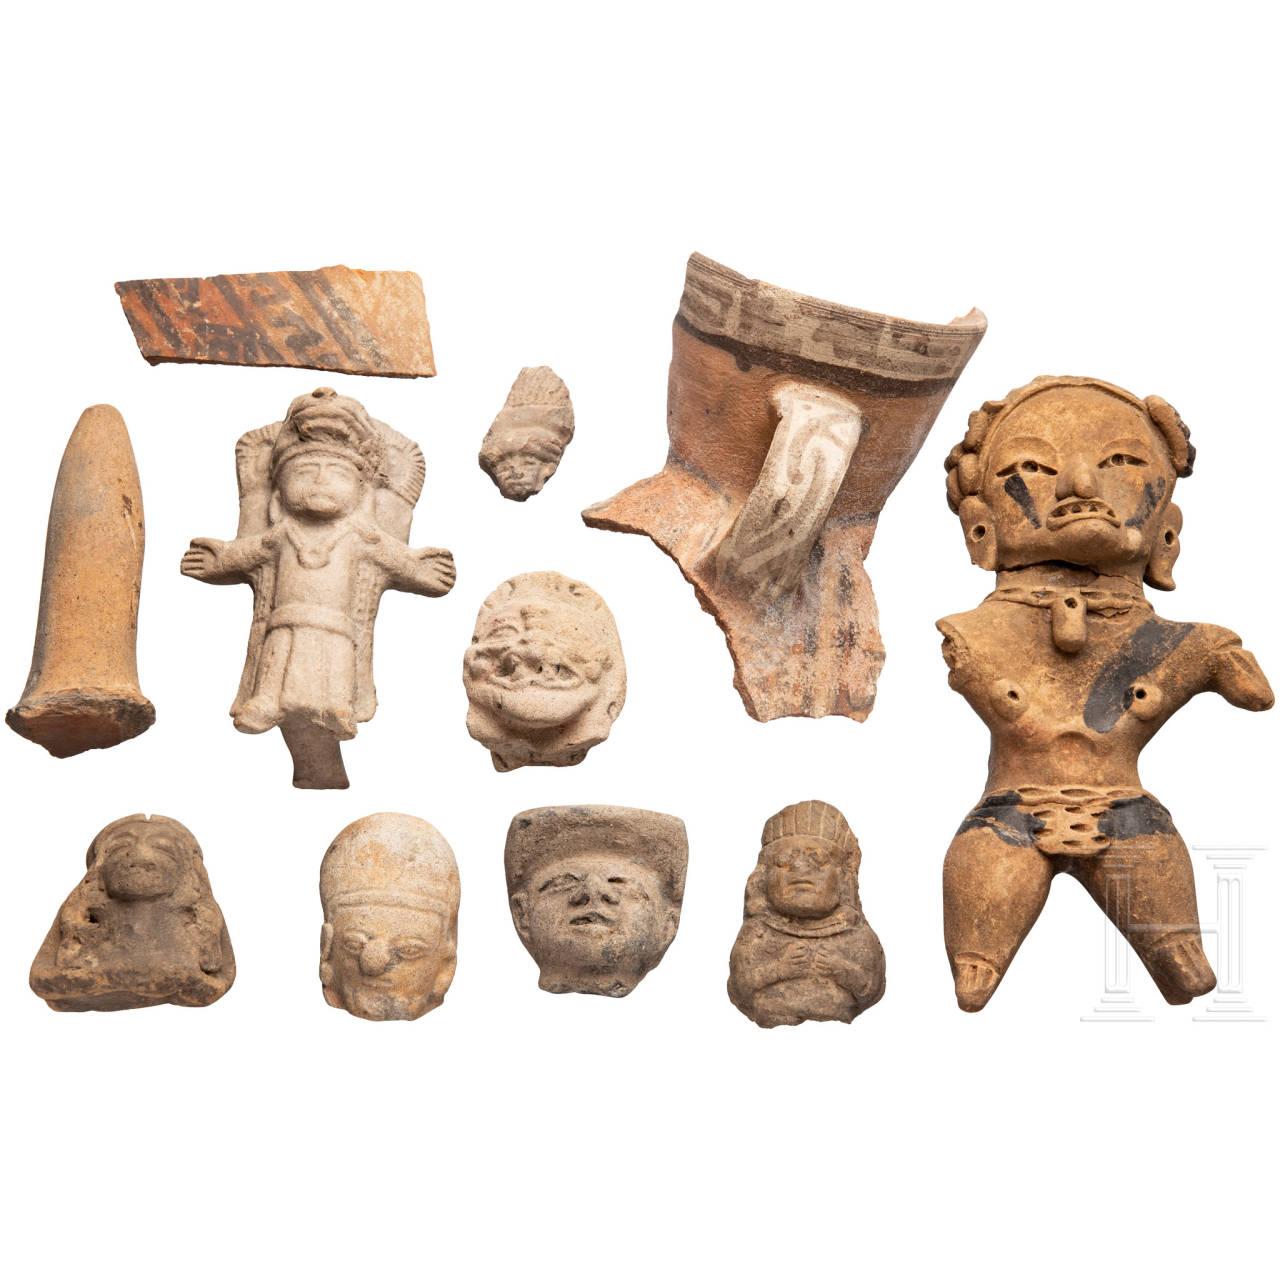 Elf Keramik- und Terrakottafragmente, Mittel- und Südamerika, präkolumbianisch